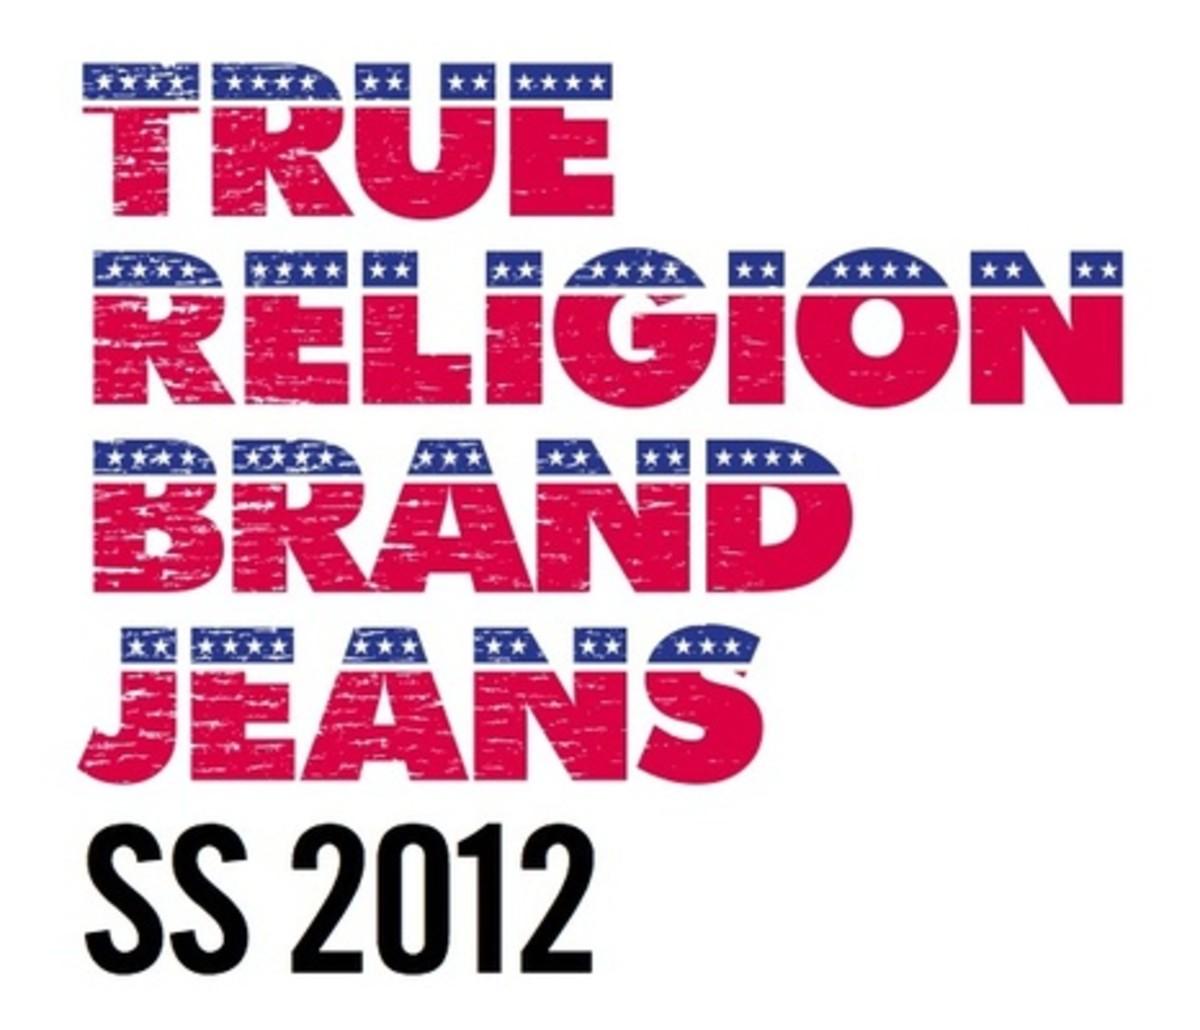 True-Religion-Brand-jeans-ss2012-womens-1-thumb-466x400-79466